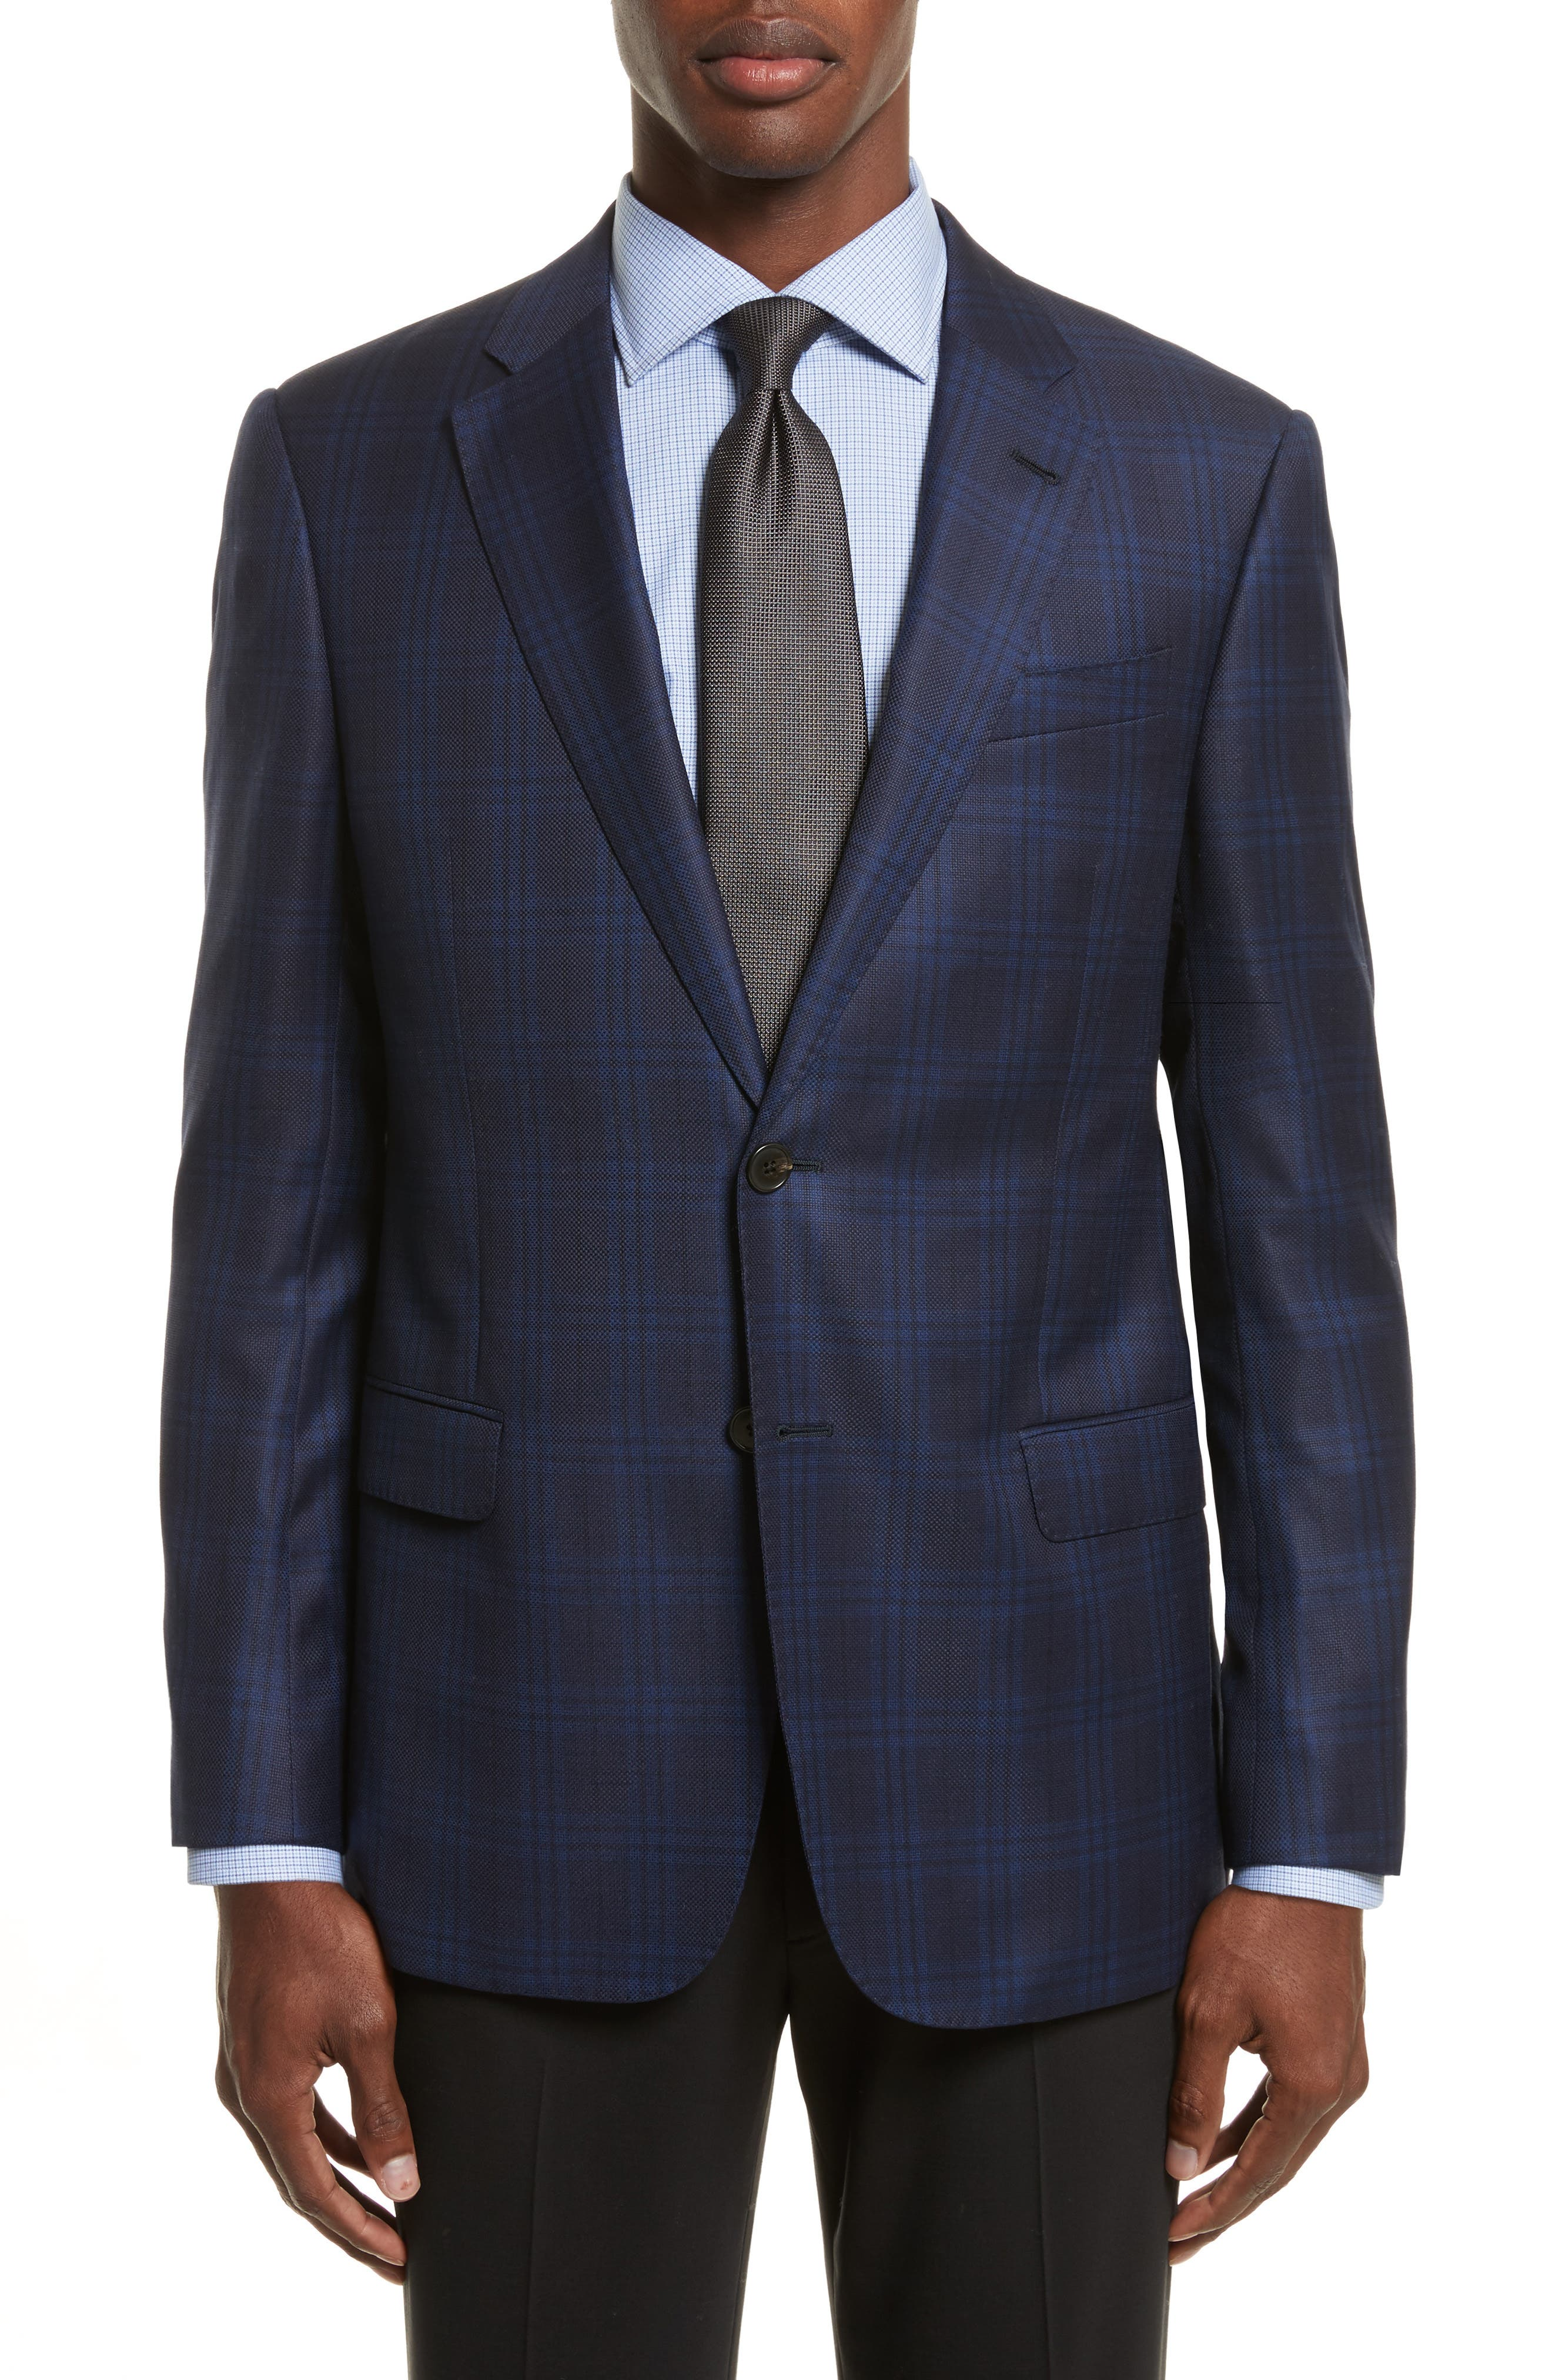 Main Image - Armani Collezioni G-Line Trim Fit Houndstooth Wool Sport Coat